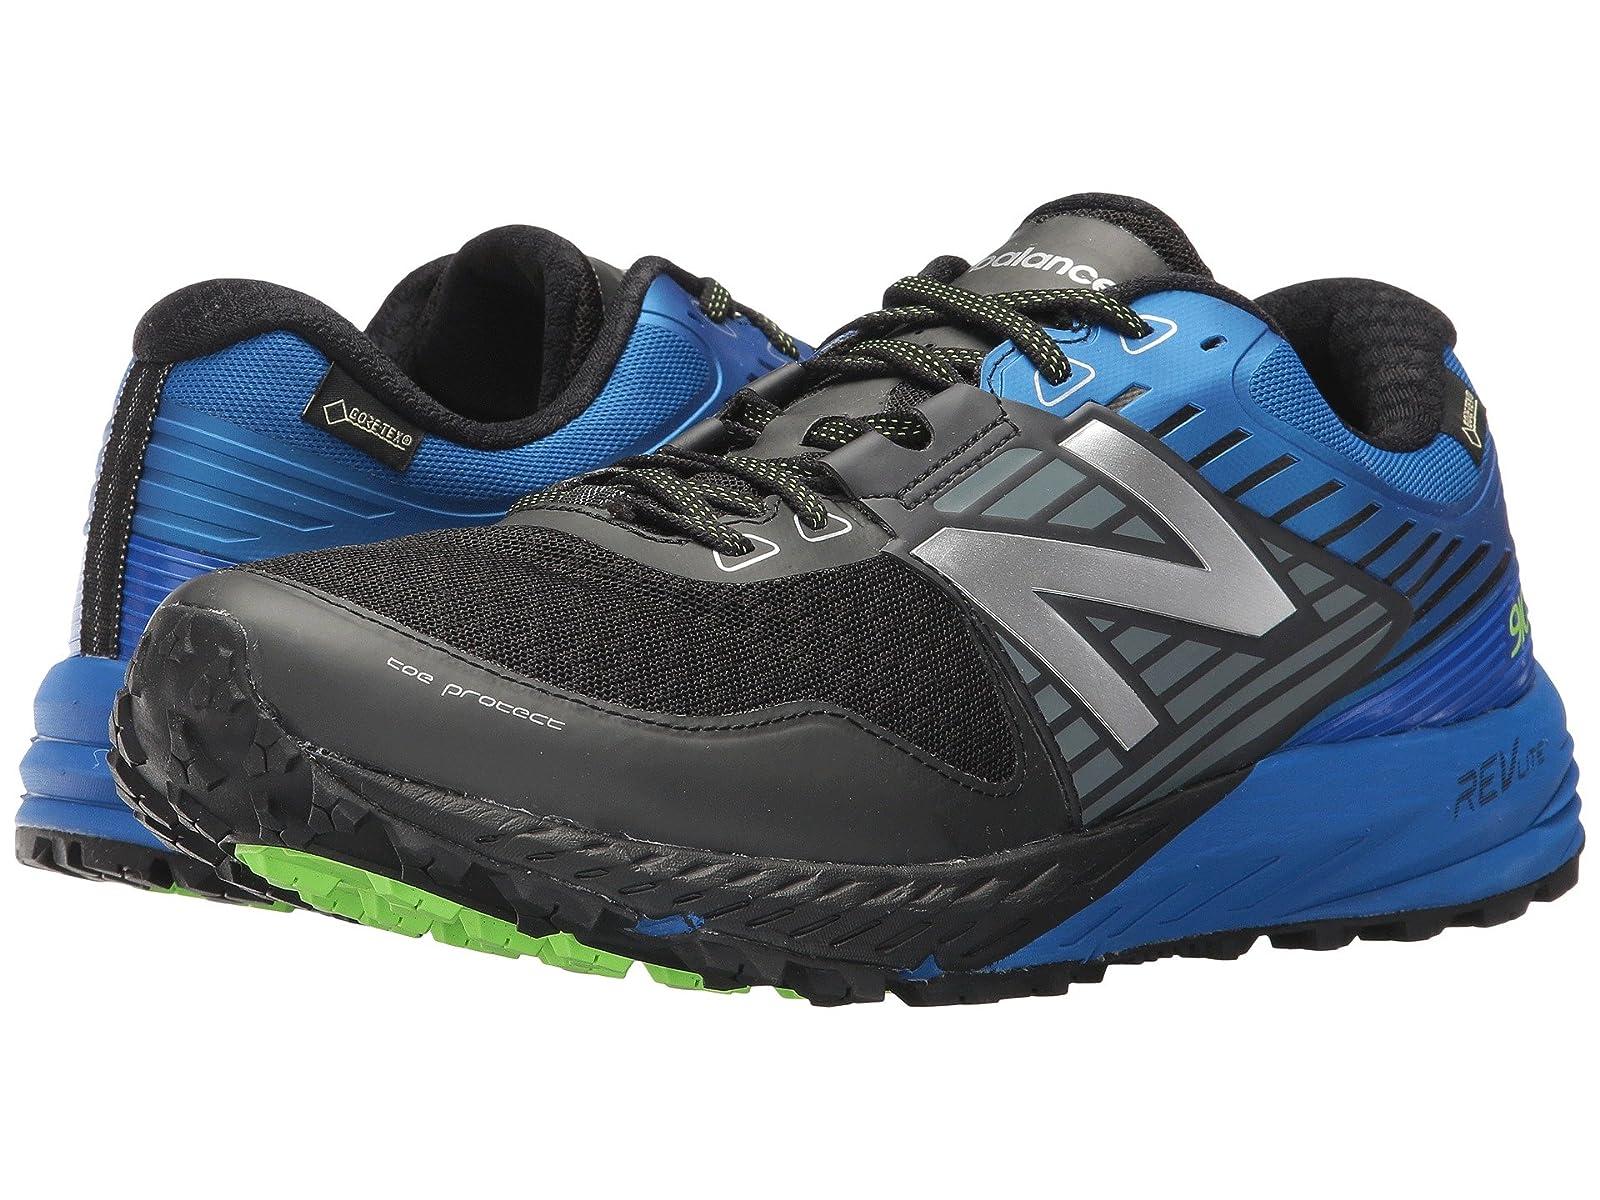 New Balance 910 V4 GTXCheap and distinctive eye-catching shoes